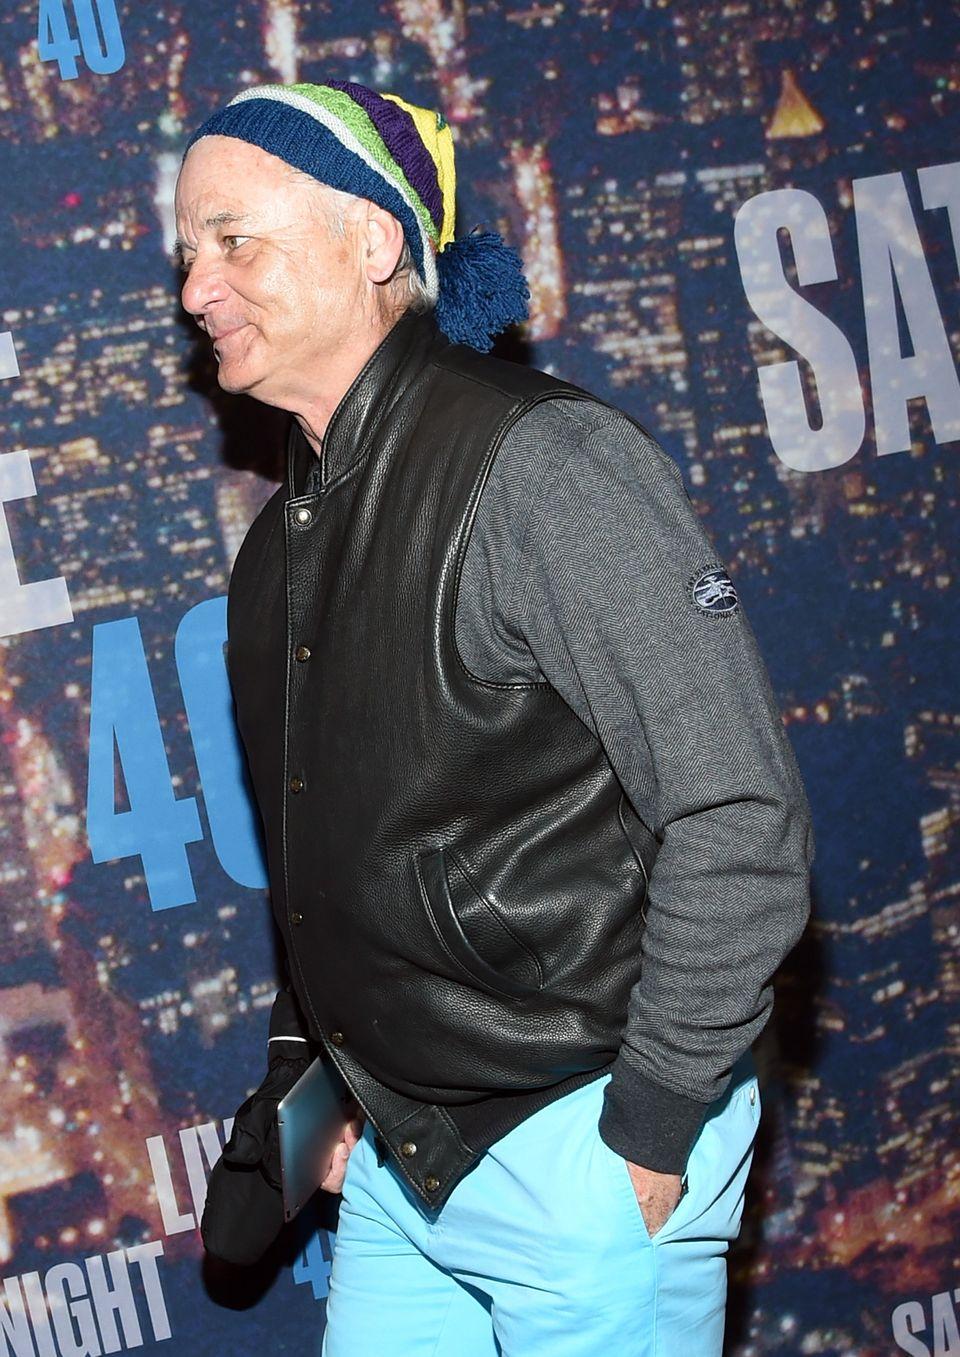 NEW YORK, NY - FEBRUARY 15:  Actor Bill Murray attends SNL 40th Anniversary Celebration at Rockefeller Plaza on February 15,